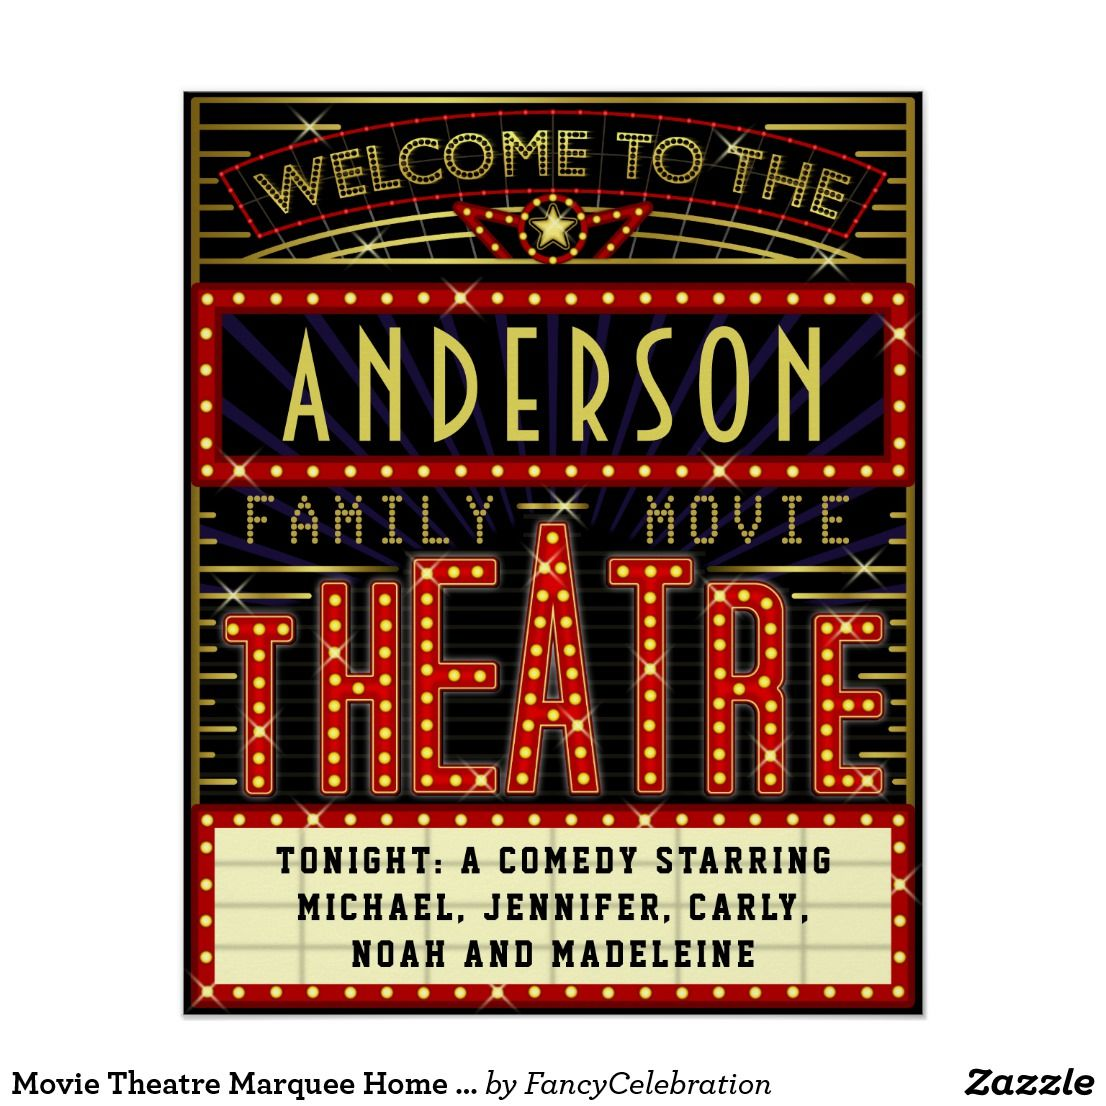 Movie Theatre Marquee Home Cinema